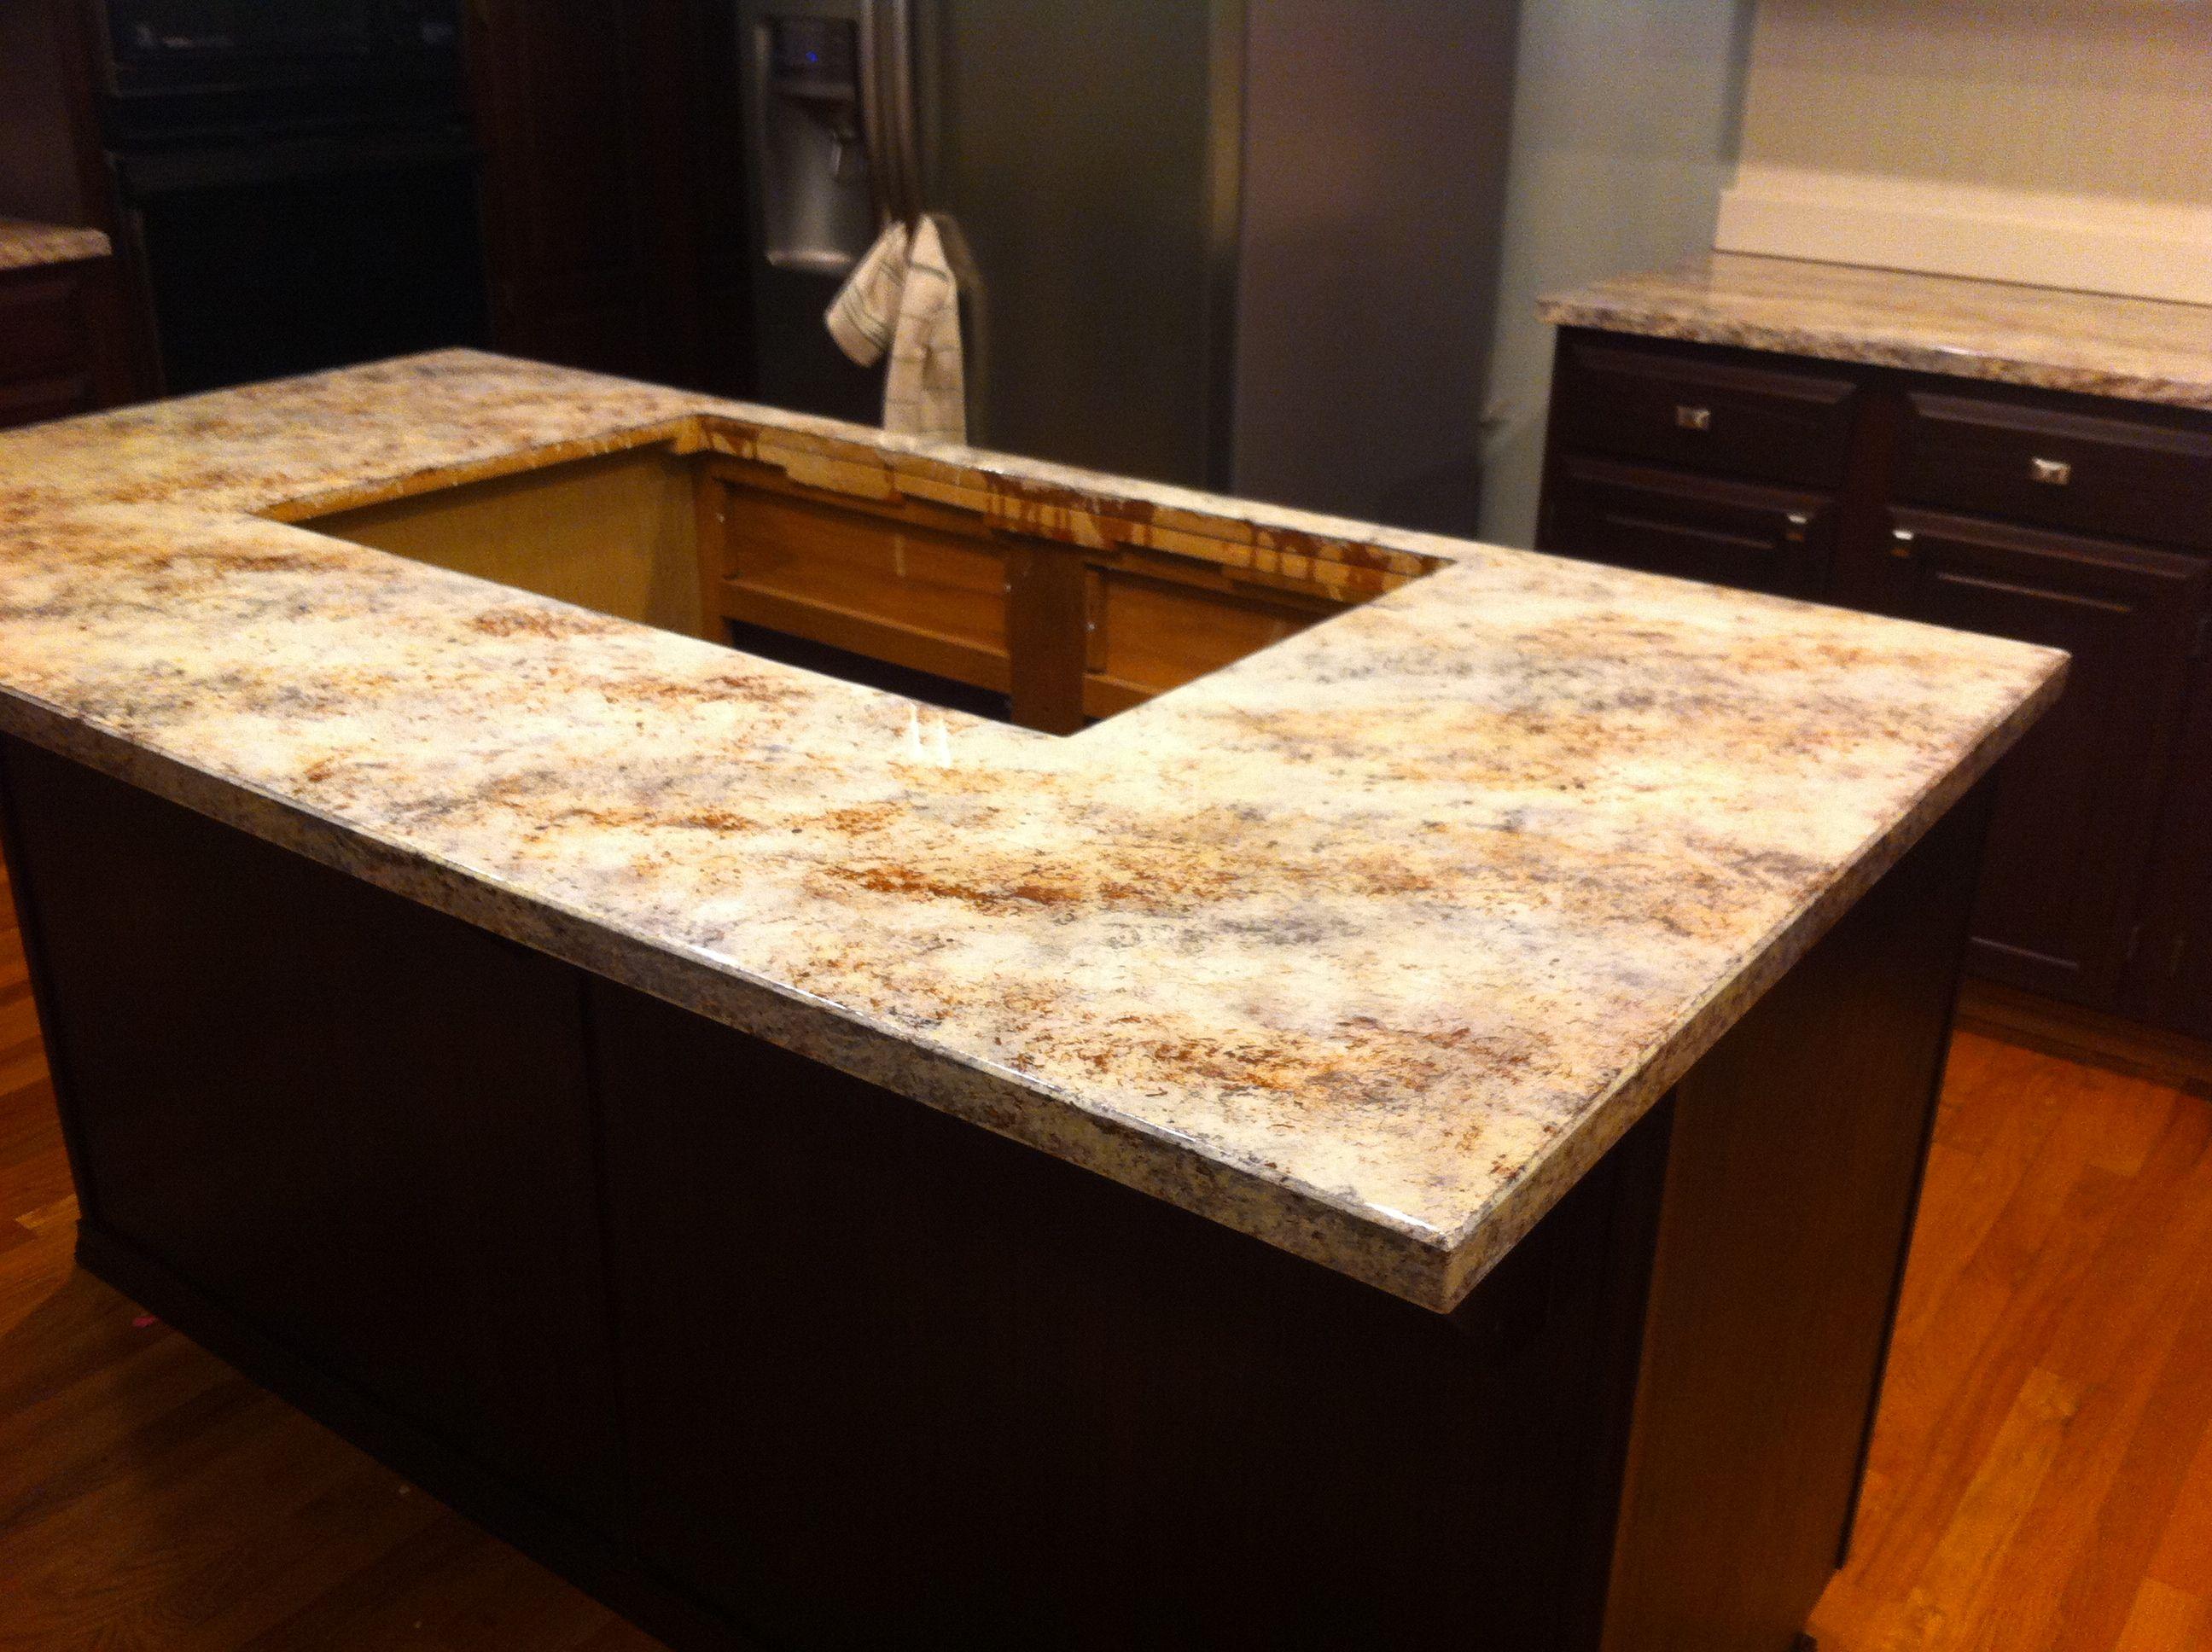 Faux Sho Painted Granite Countertops